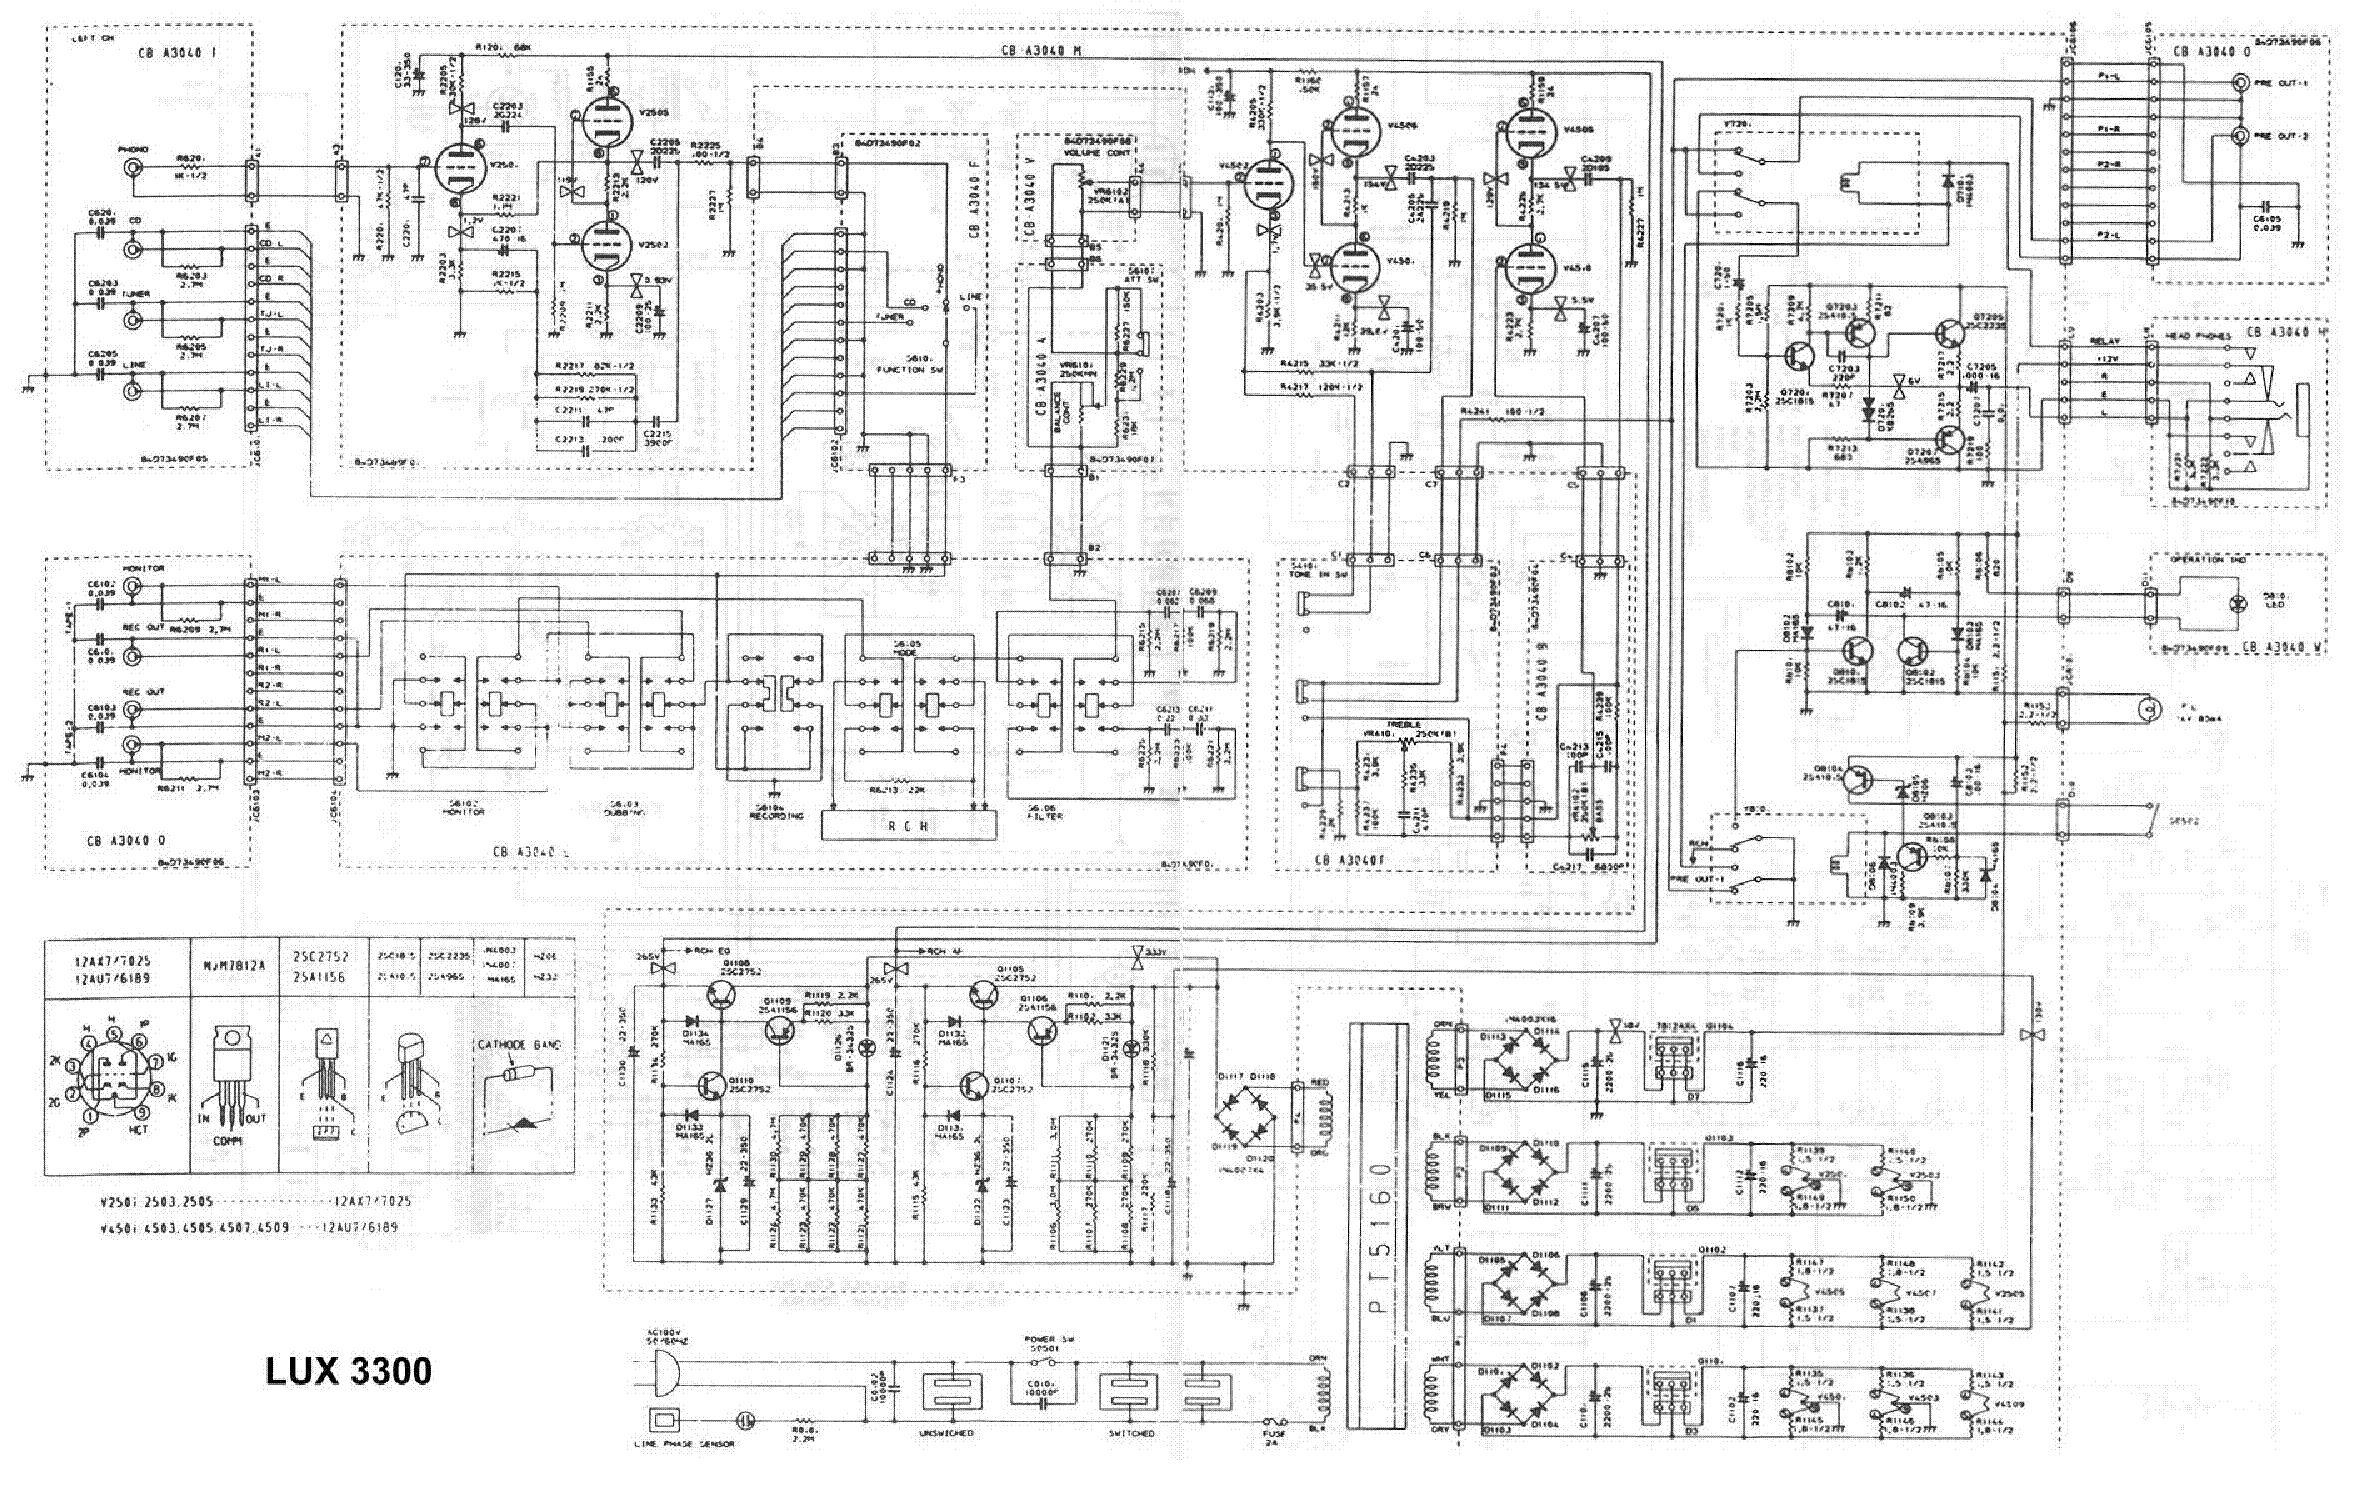 luxman 3300 preamplifier sch service manual download